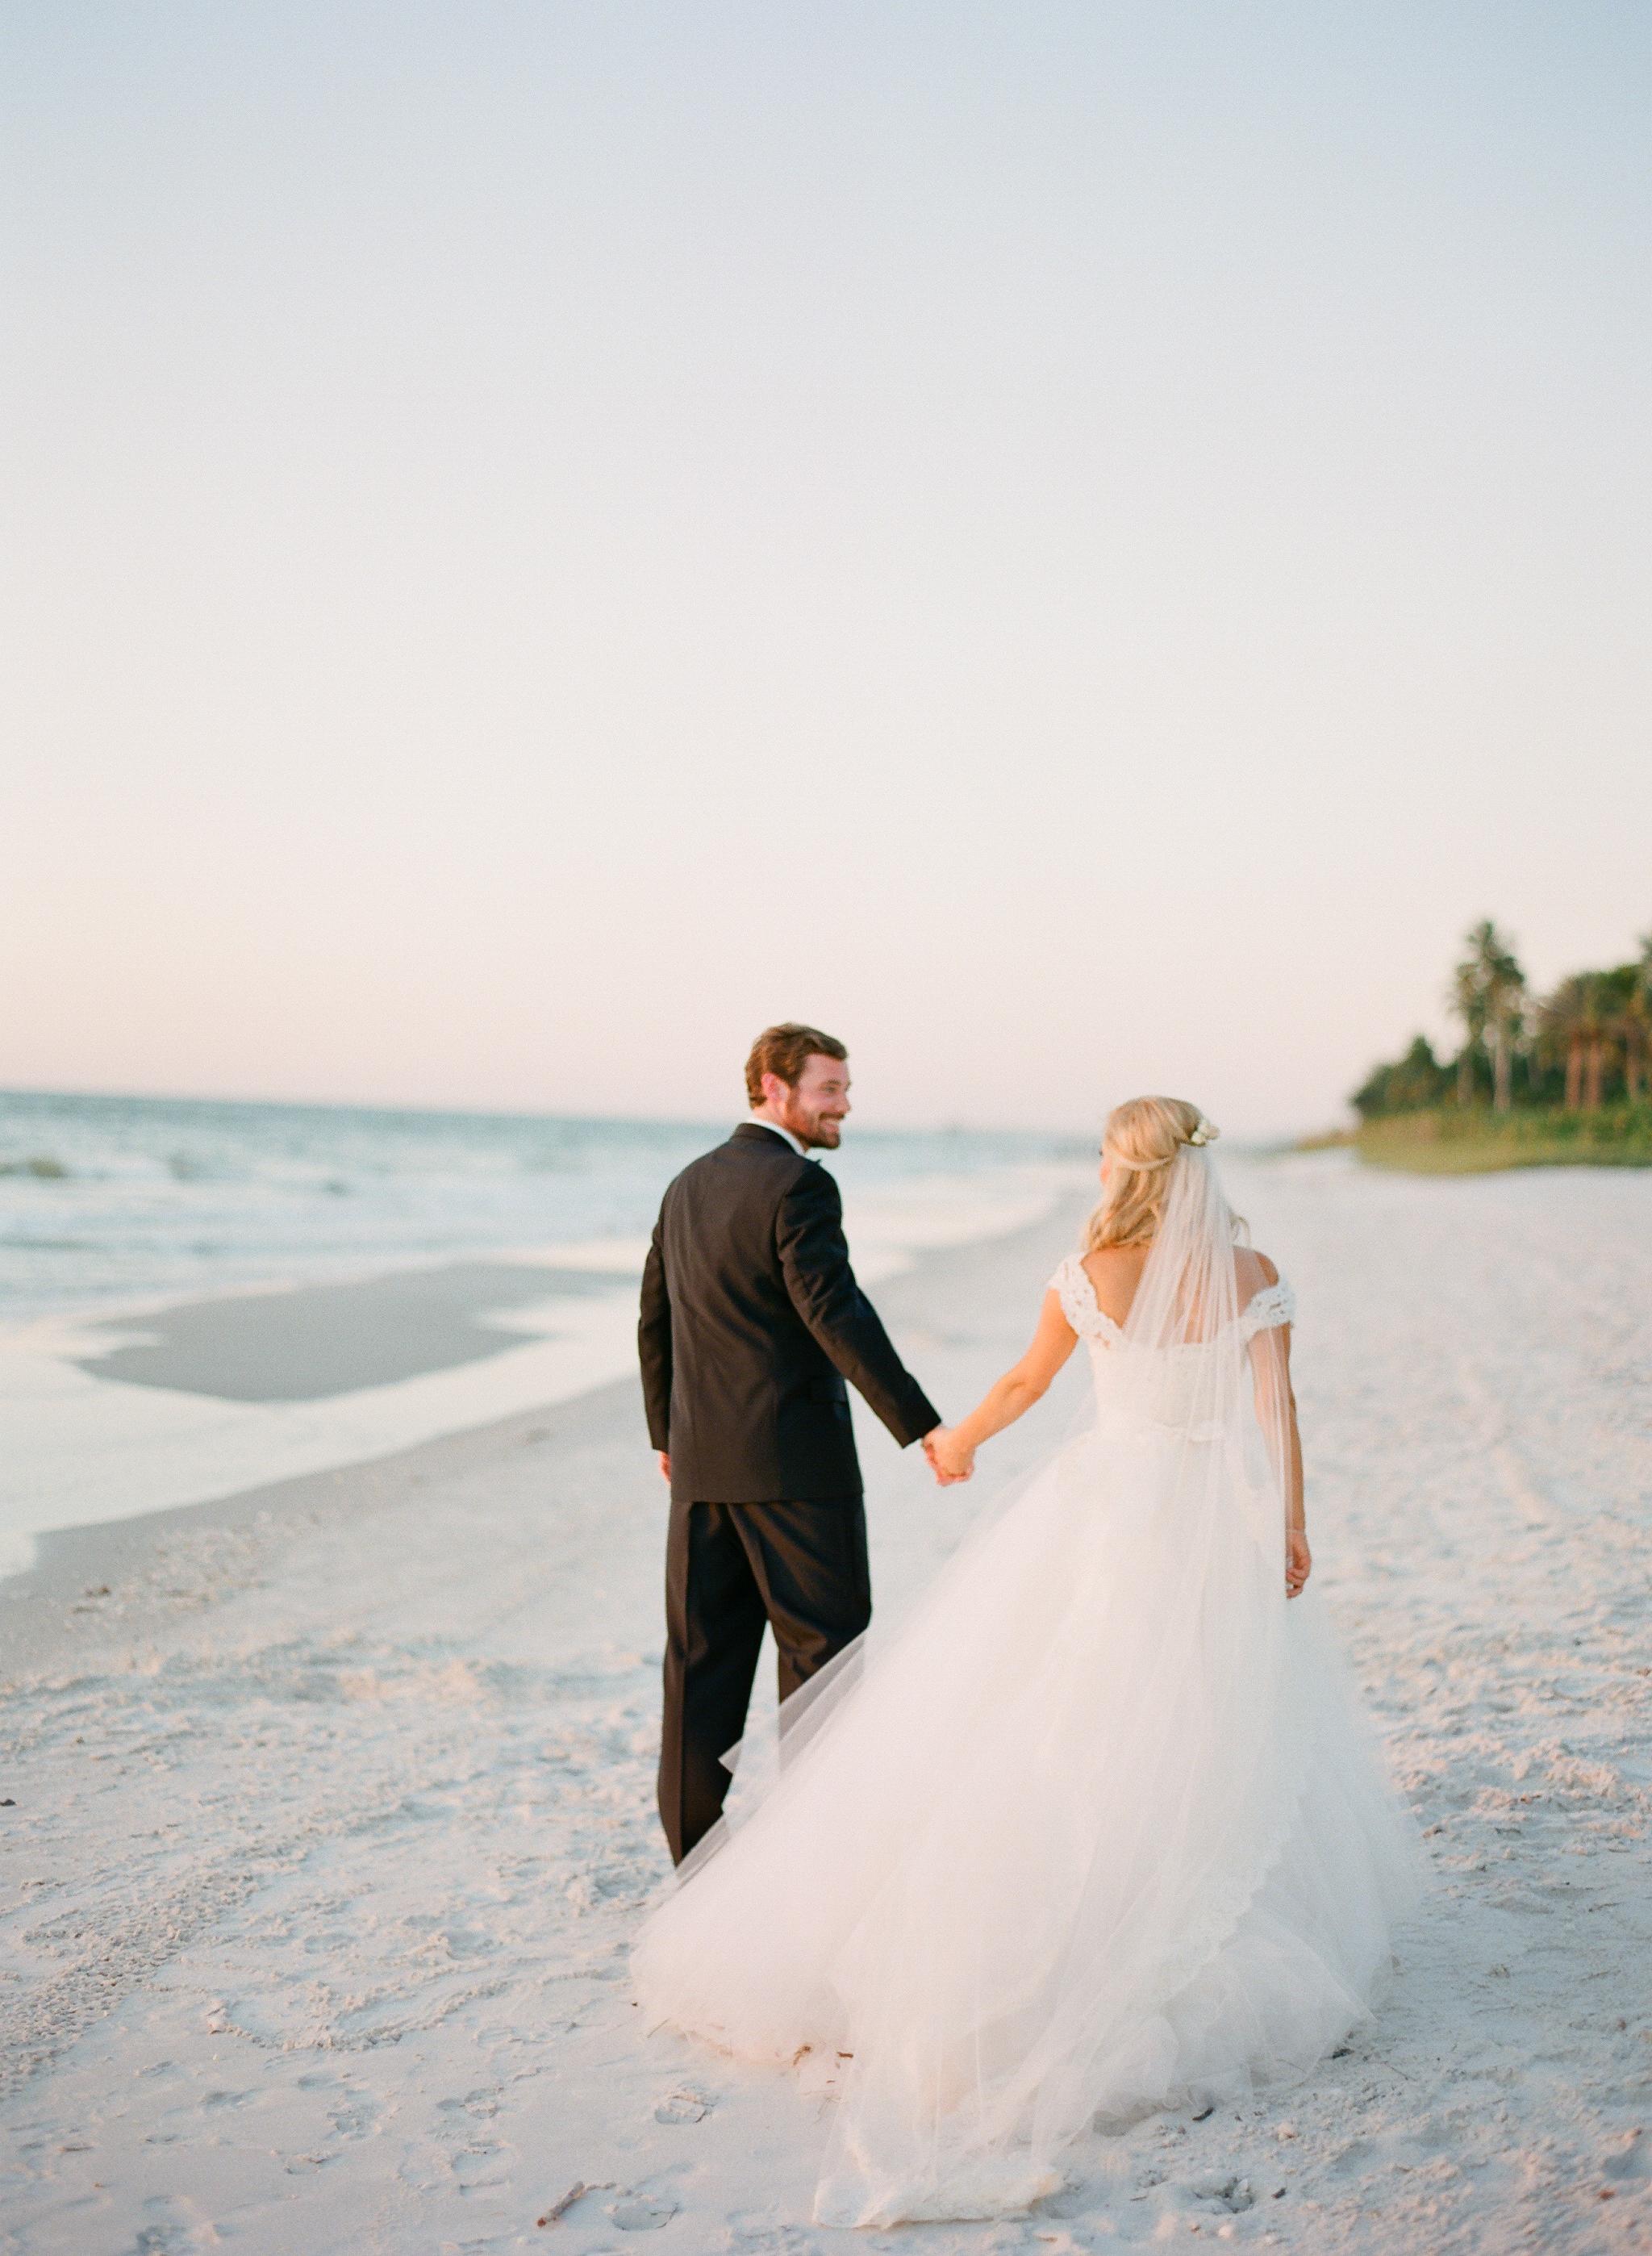 Ceci_New_York_Florida_Wedding_Style_Bride_Watercolor_Real_Custom_Luxury_92.jpg